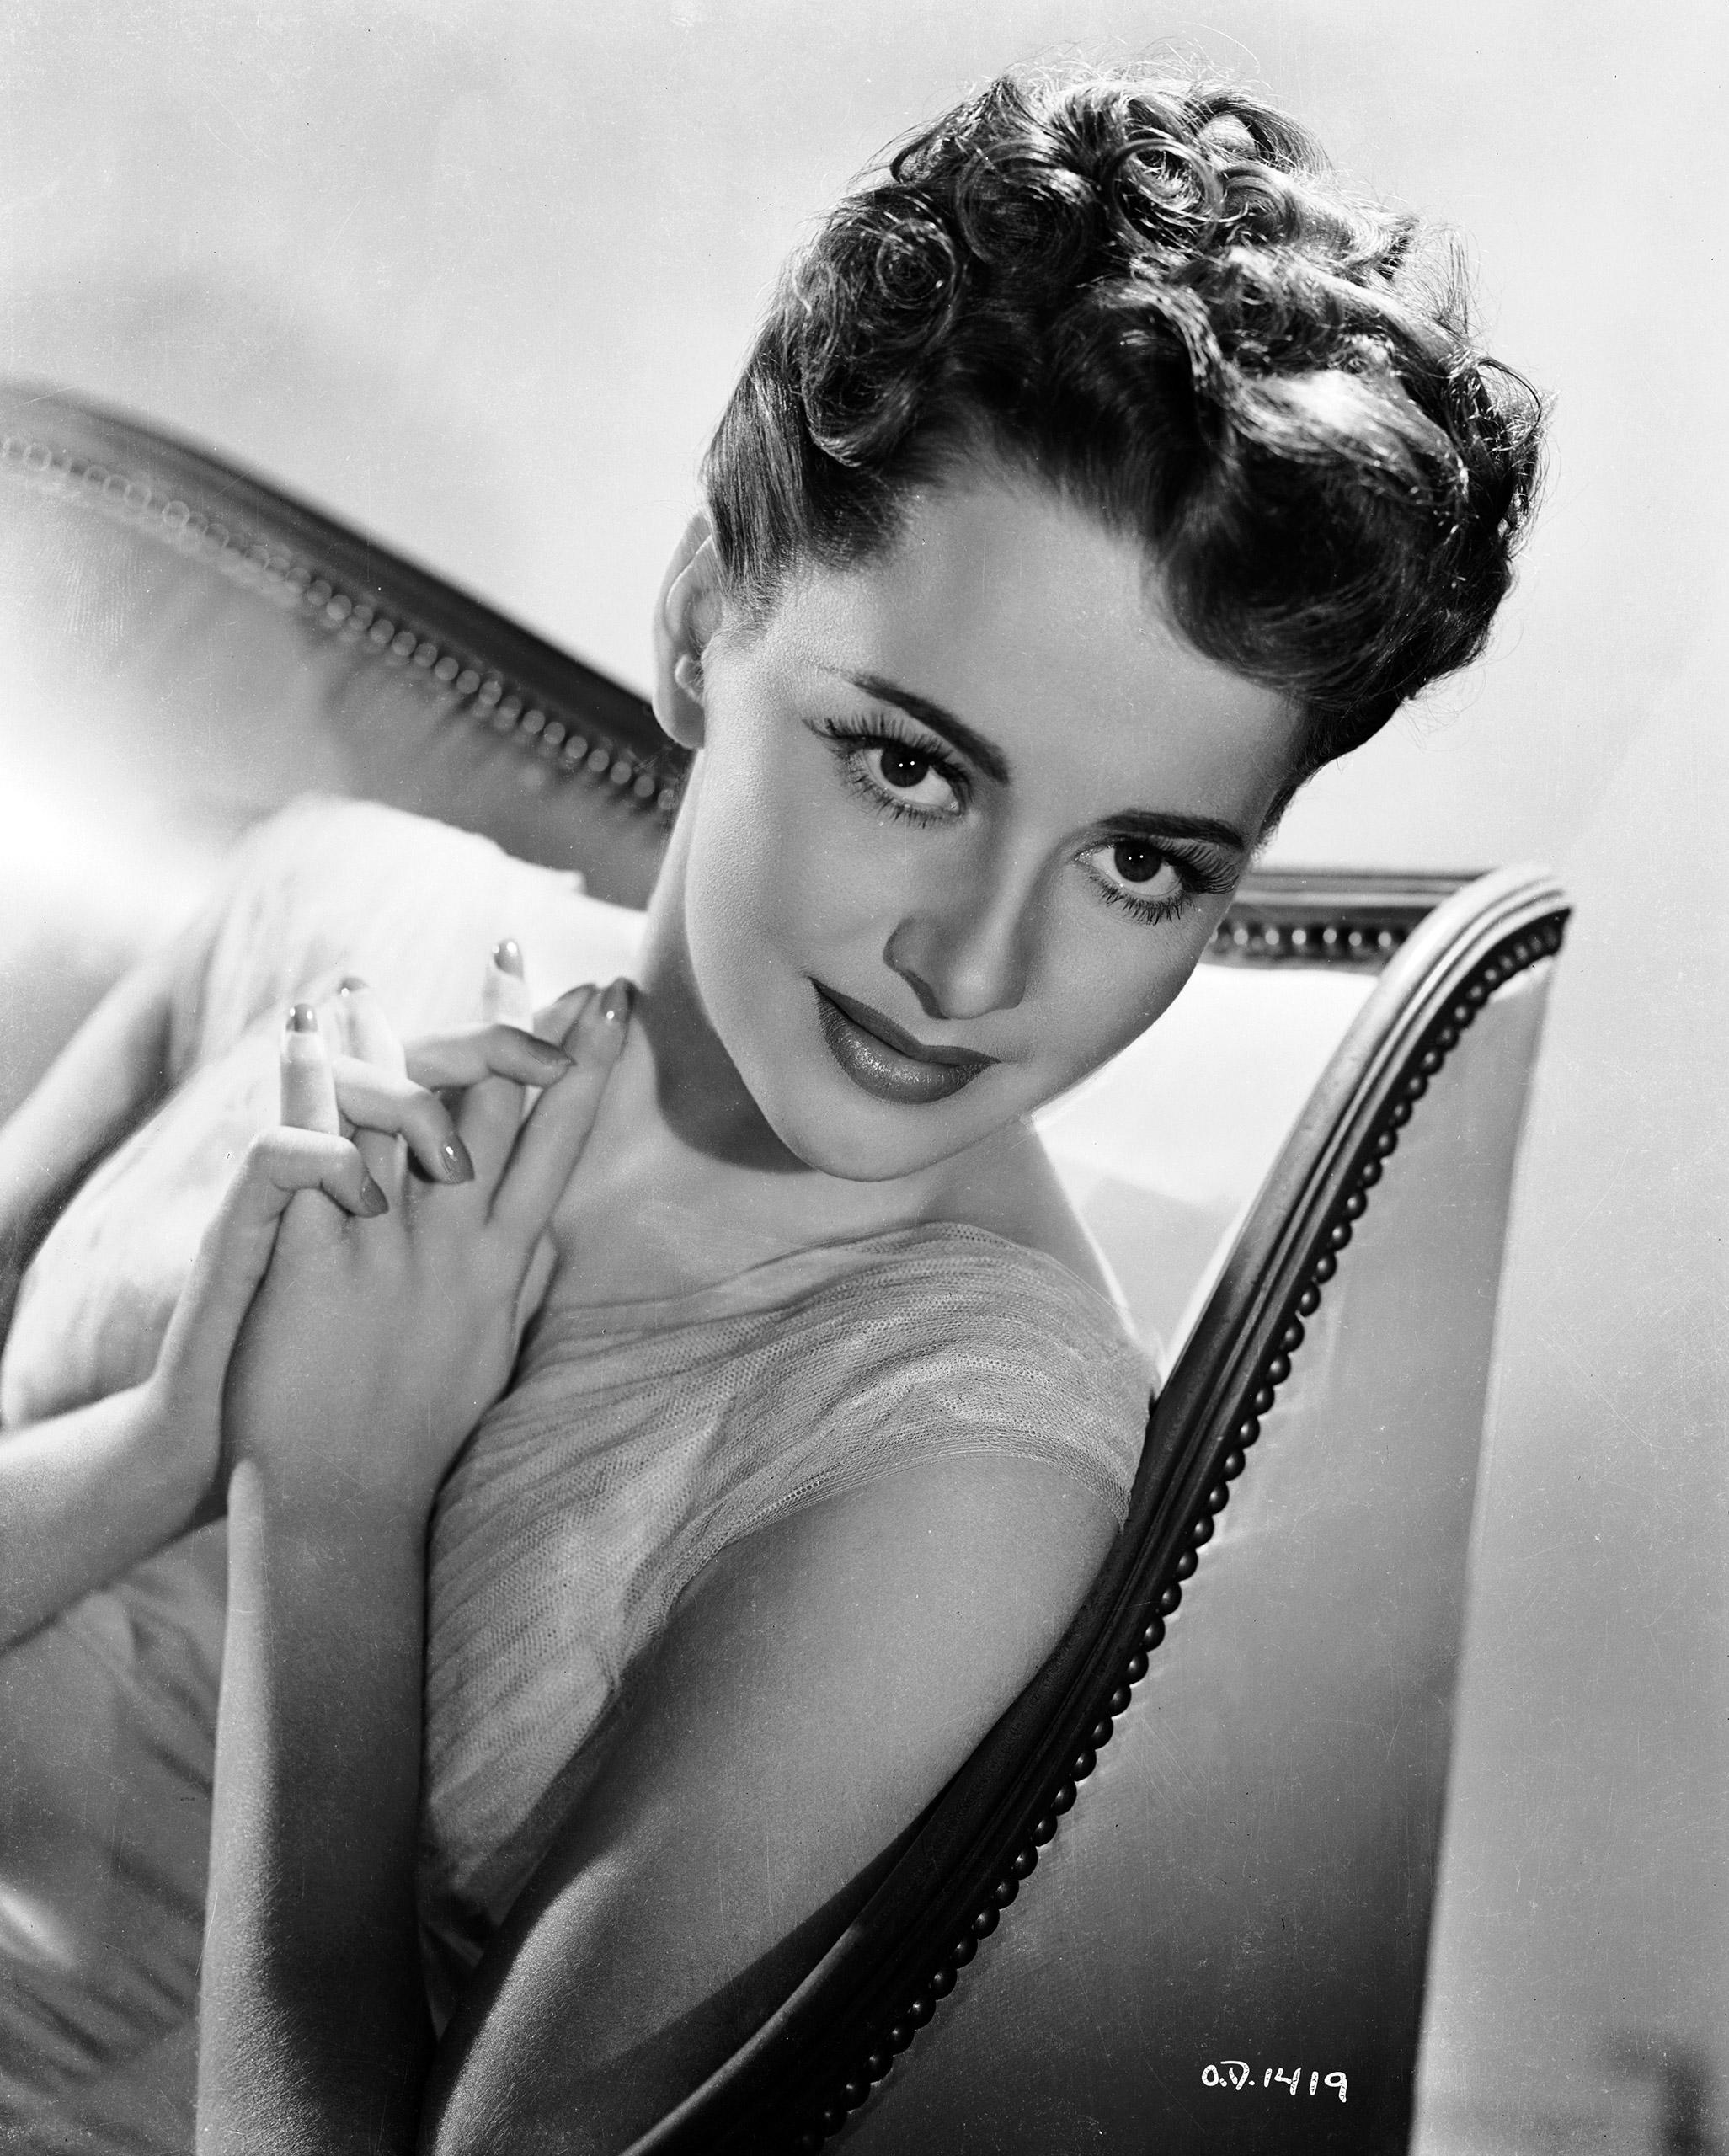 Portrait of Olivia de Havilland, circa 1940.